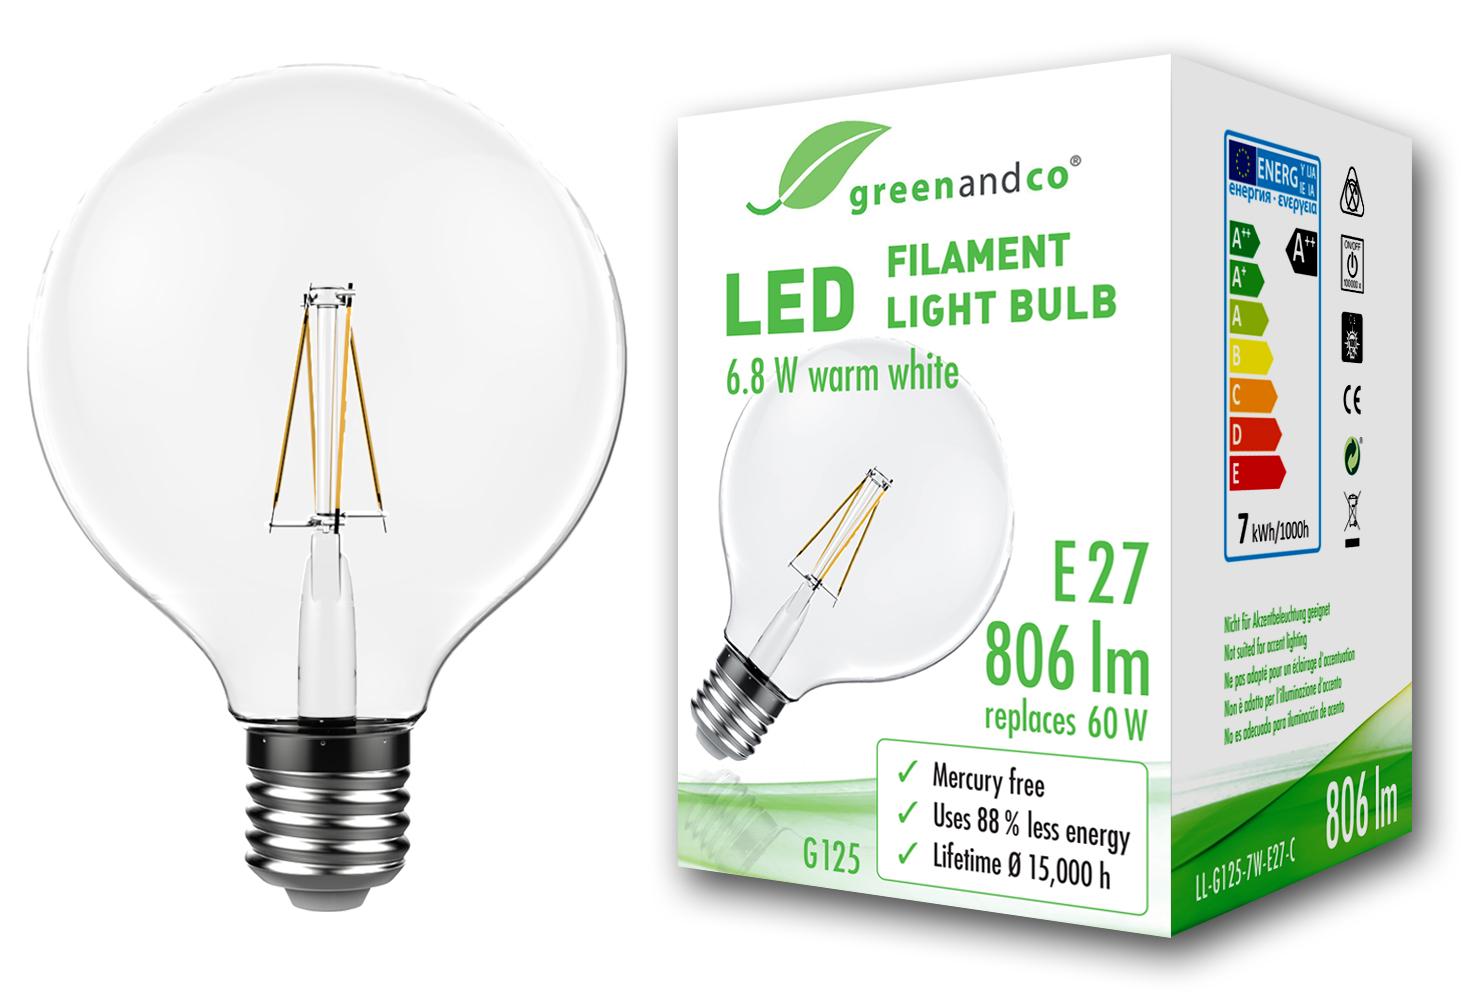 Glühfaden LED Lampe Globe ersetzt 60W E27 G125 6.8W 806lm 2700K ...